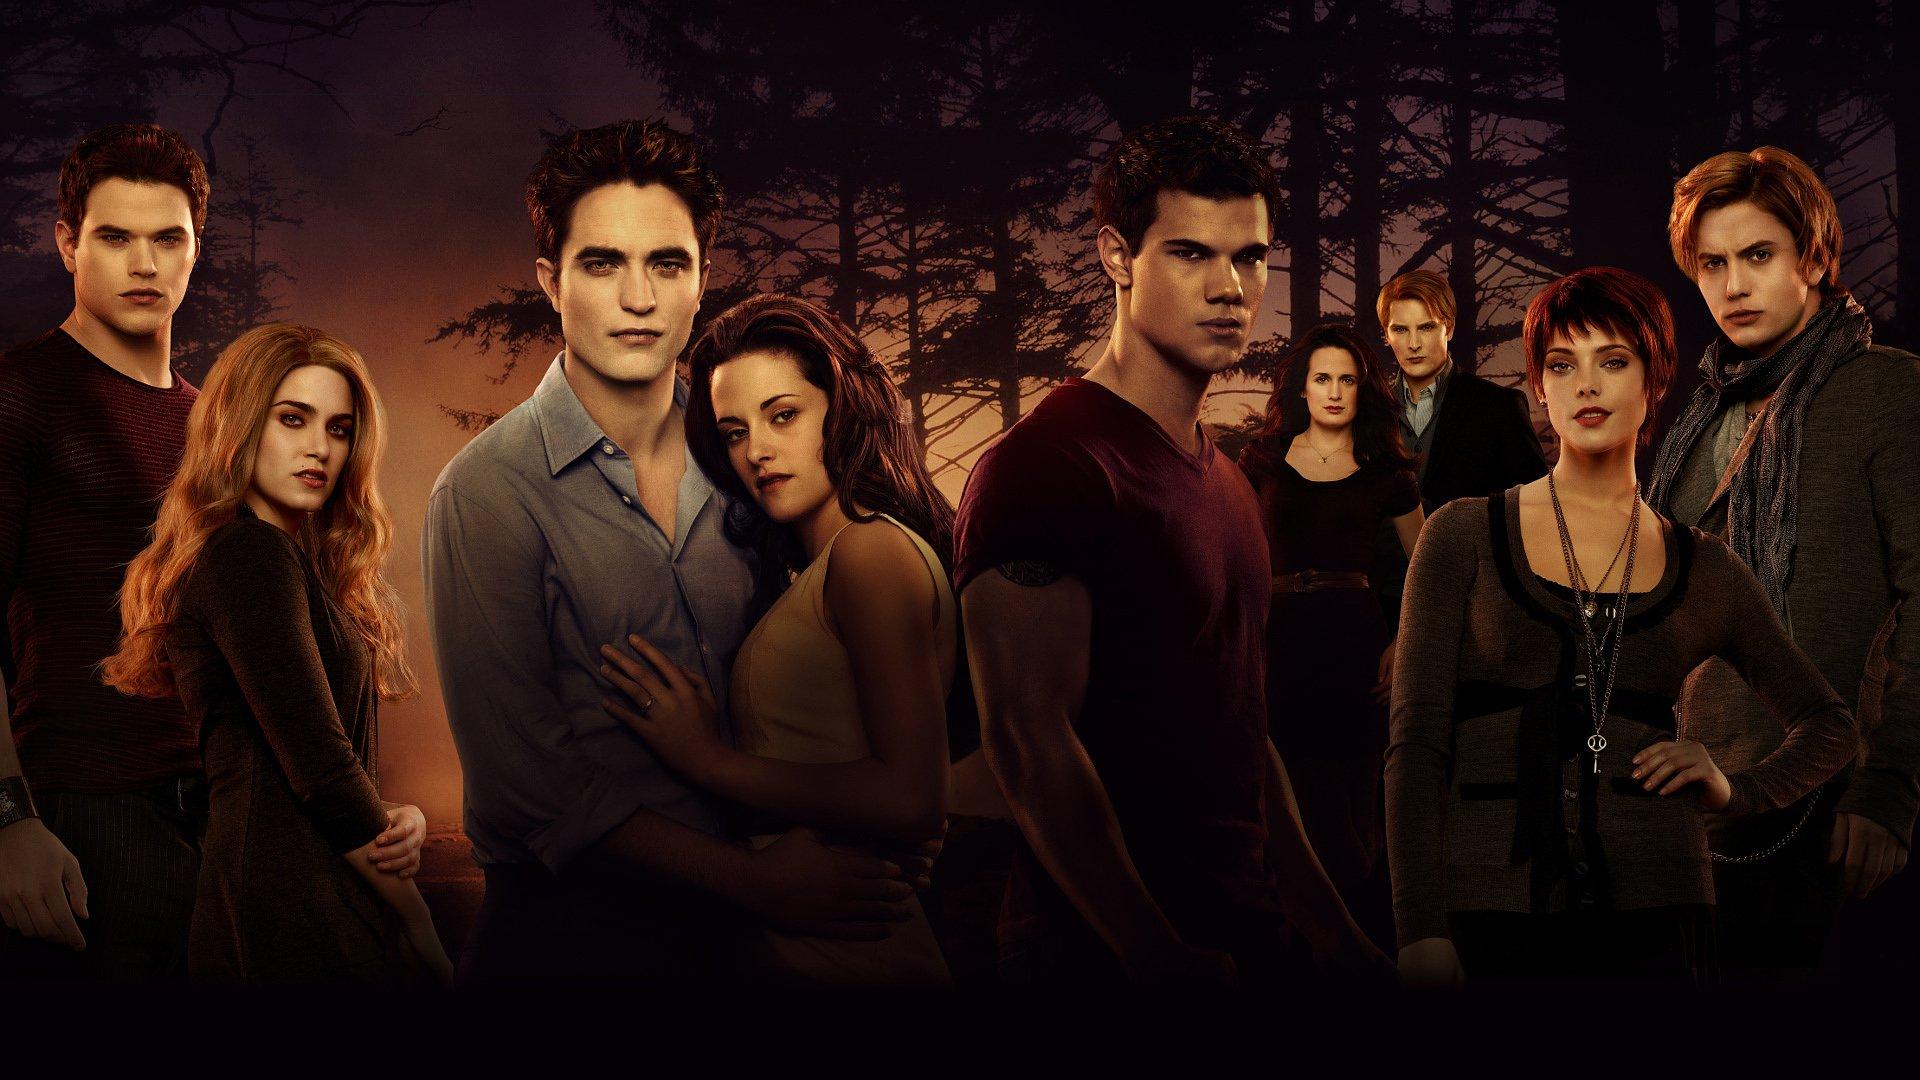 The Twilight Saga Breaking Dawn Part 1 Hd Wallpaper Background Image 1920x1080 Id 825471 Wallpaper Abyss